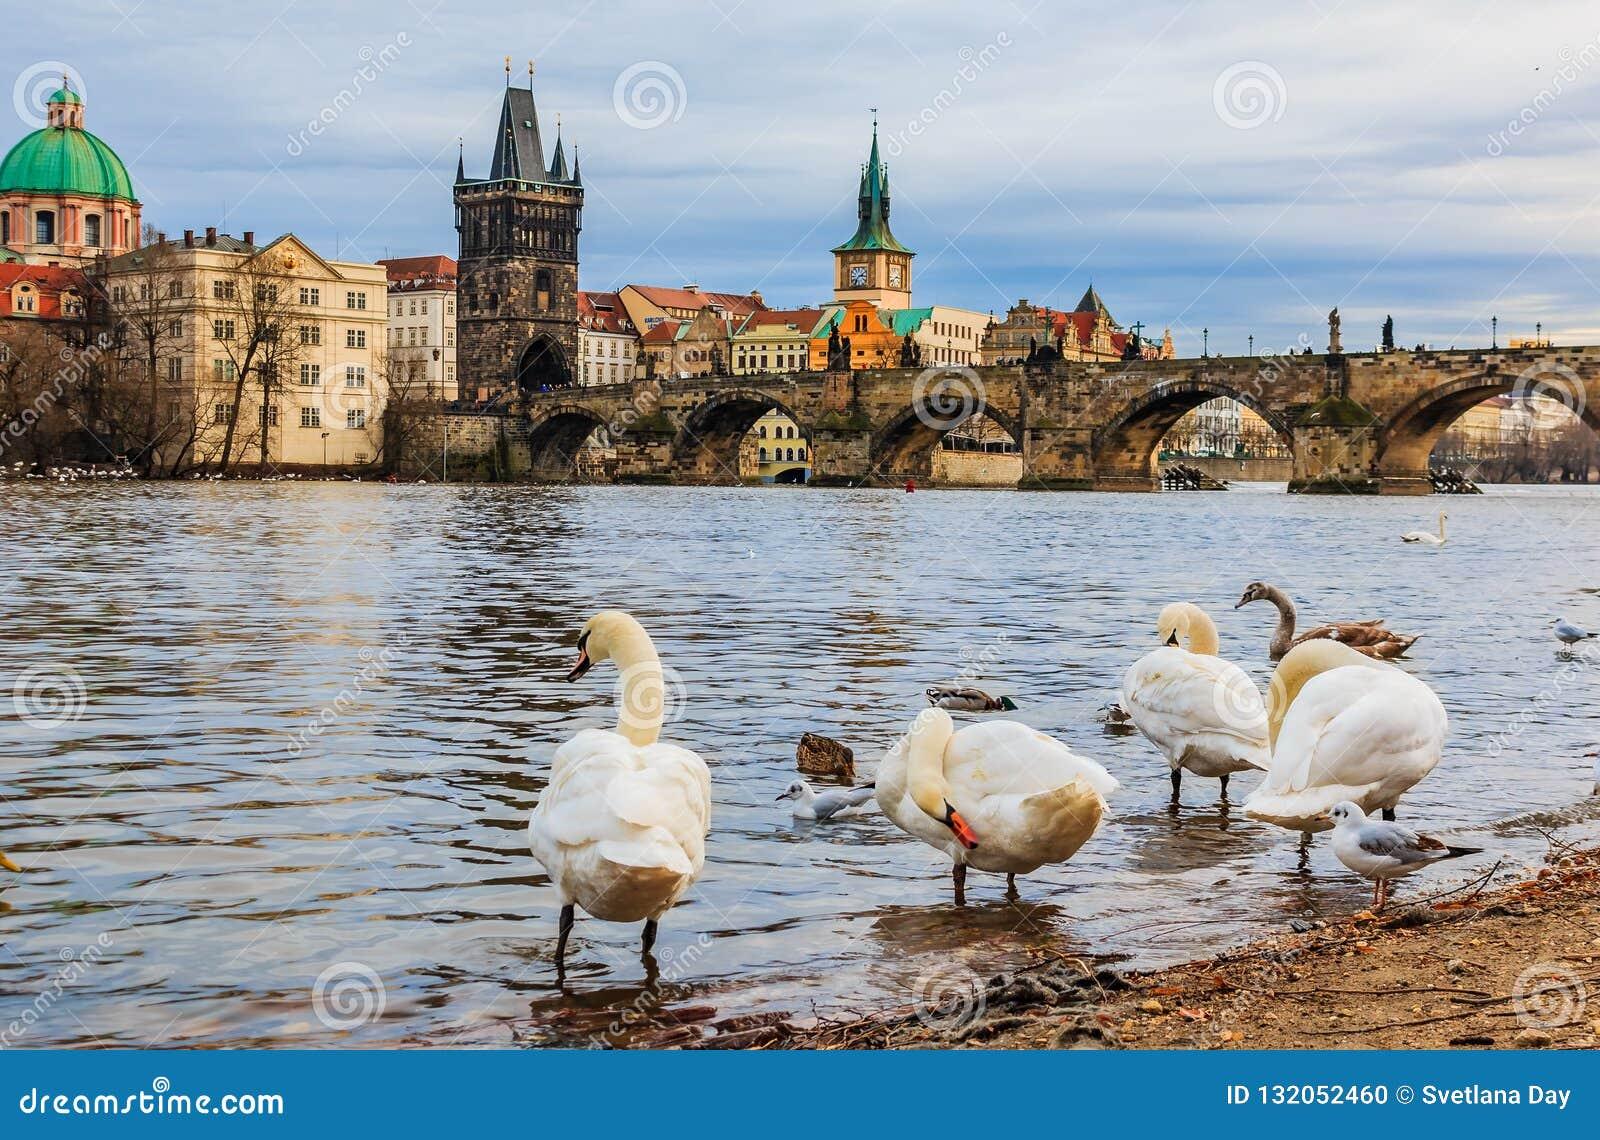 Charles bridge and swans on Vltava river in Prague Czech Republic